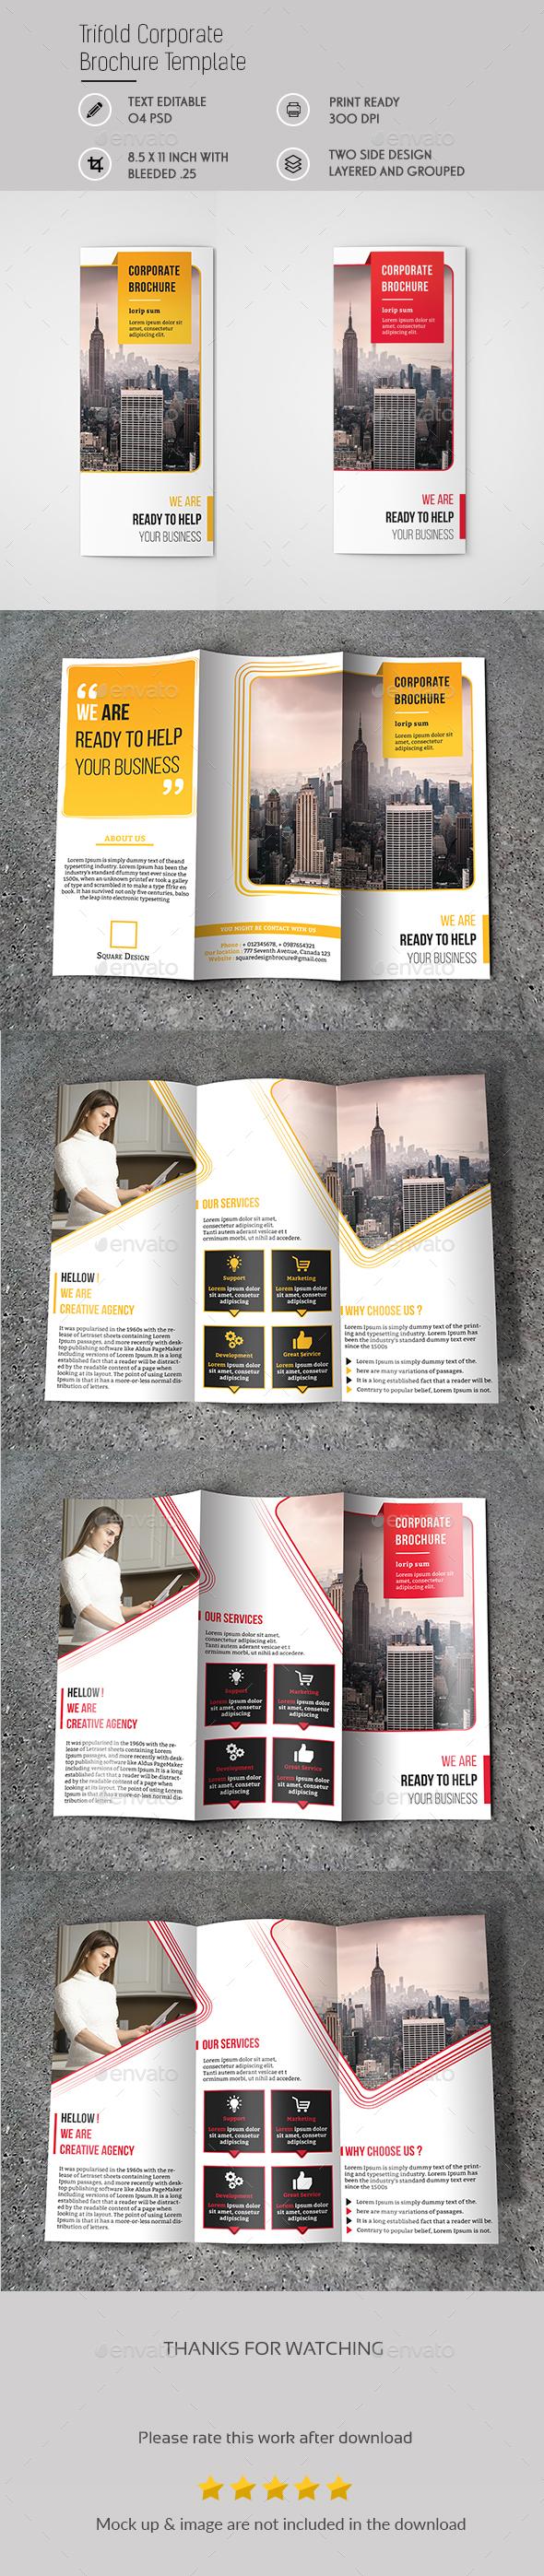 Tri fold Corporate Brochure Template - Brochures Print Templates